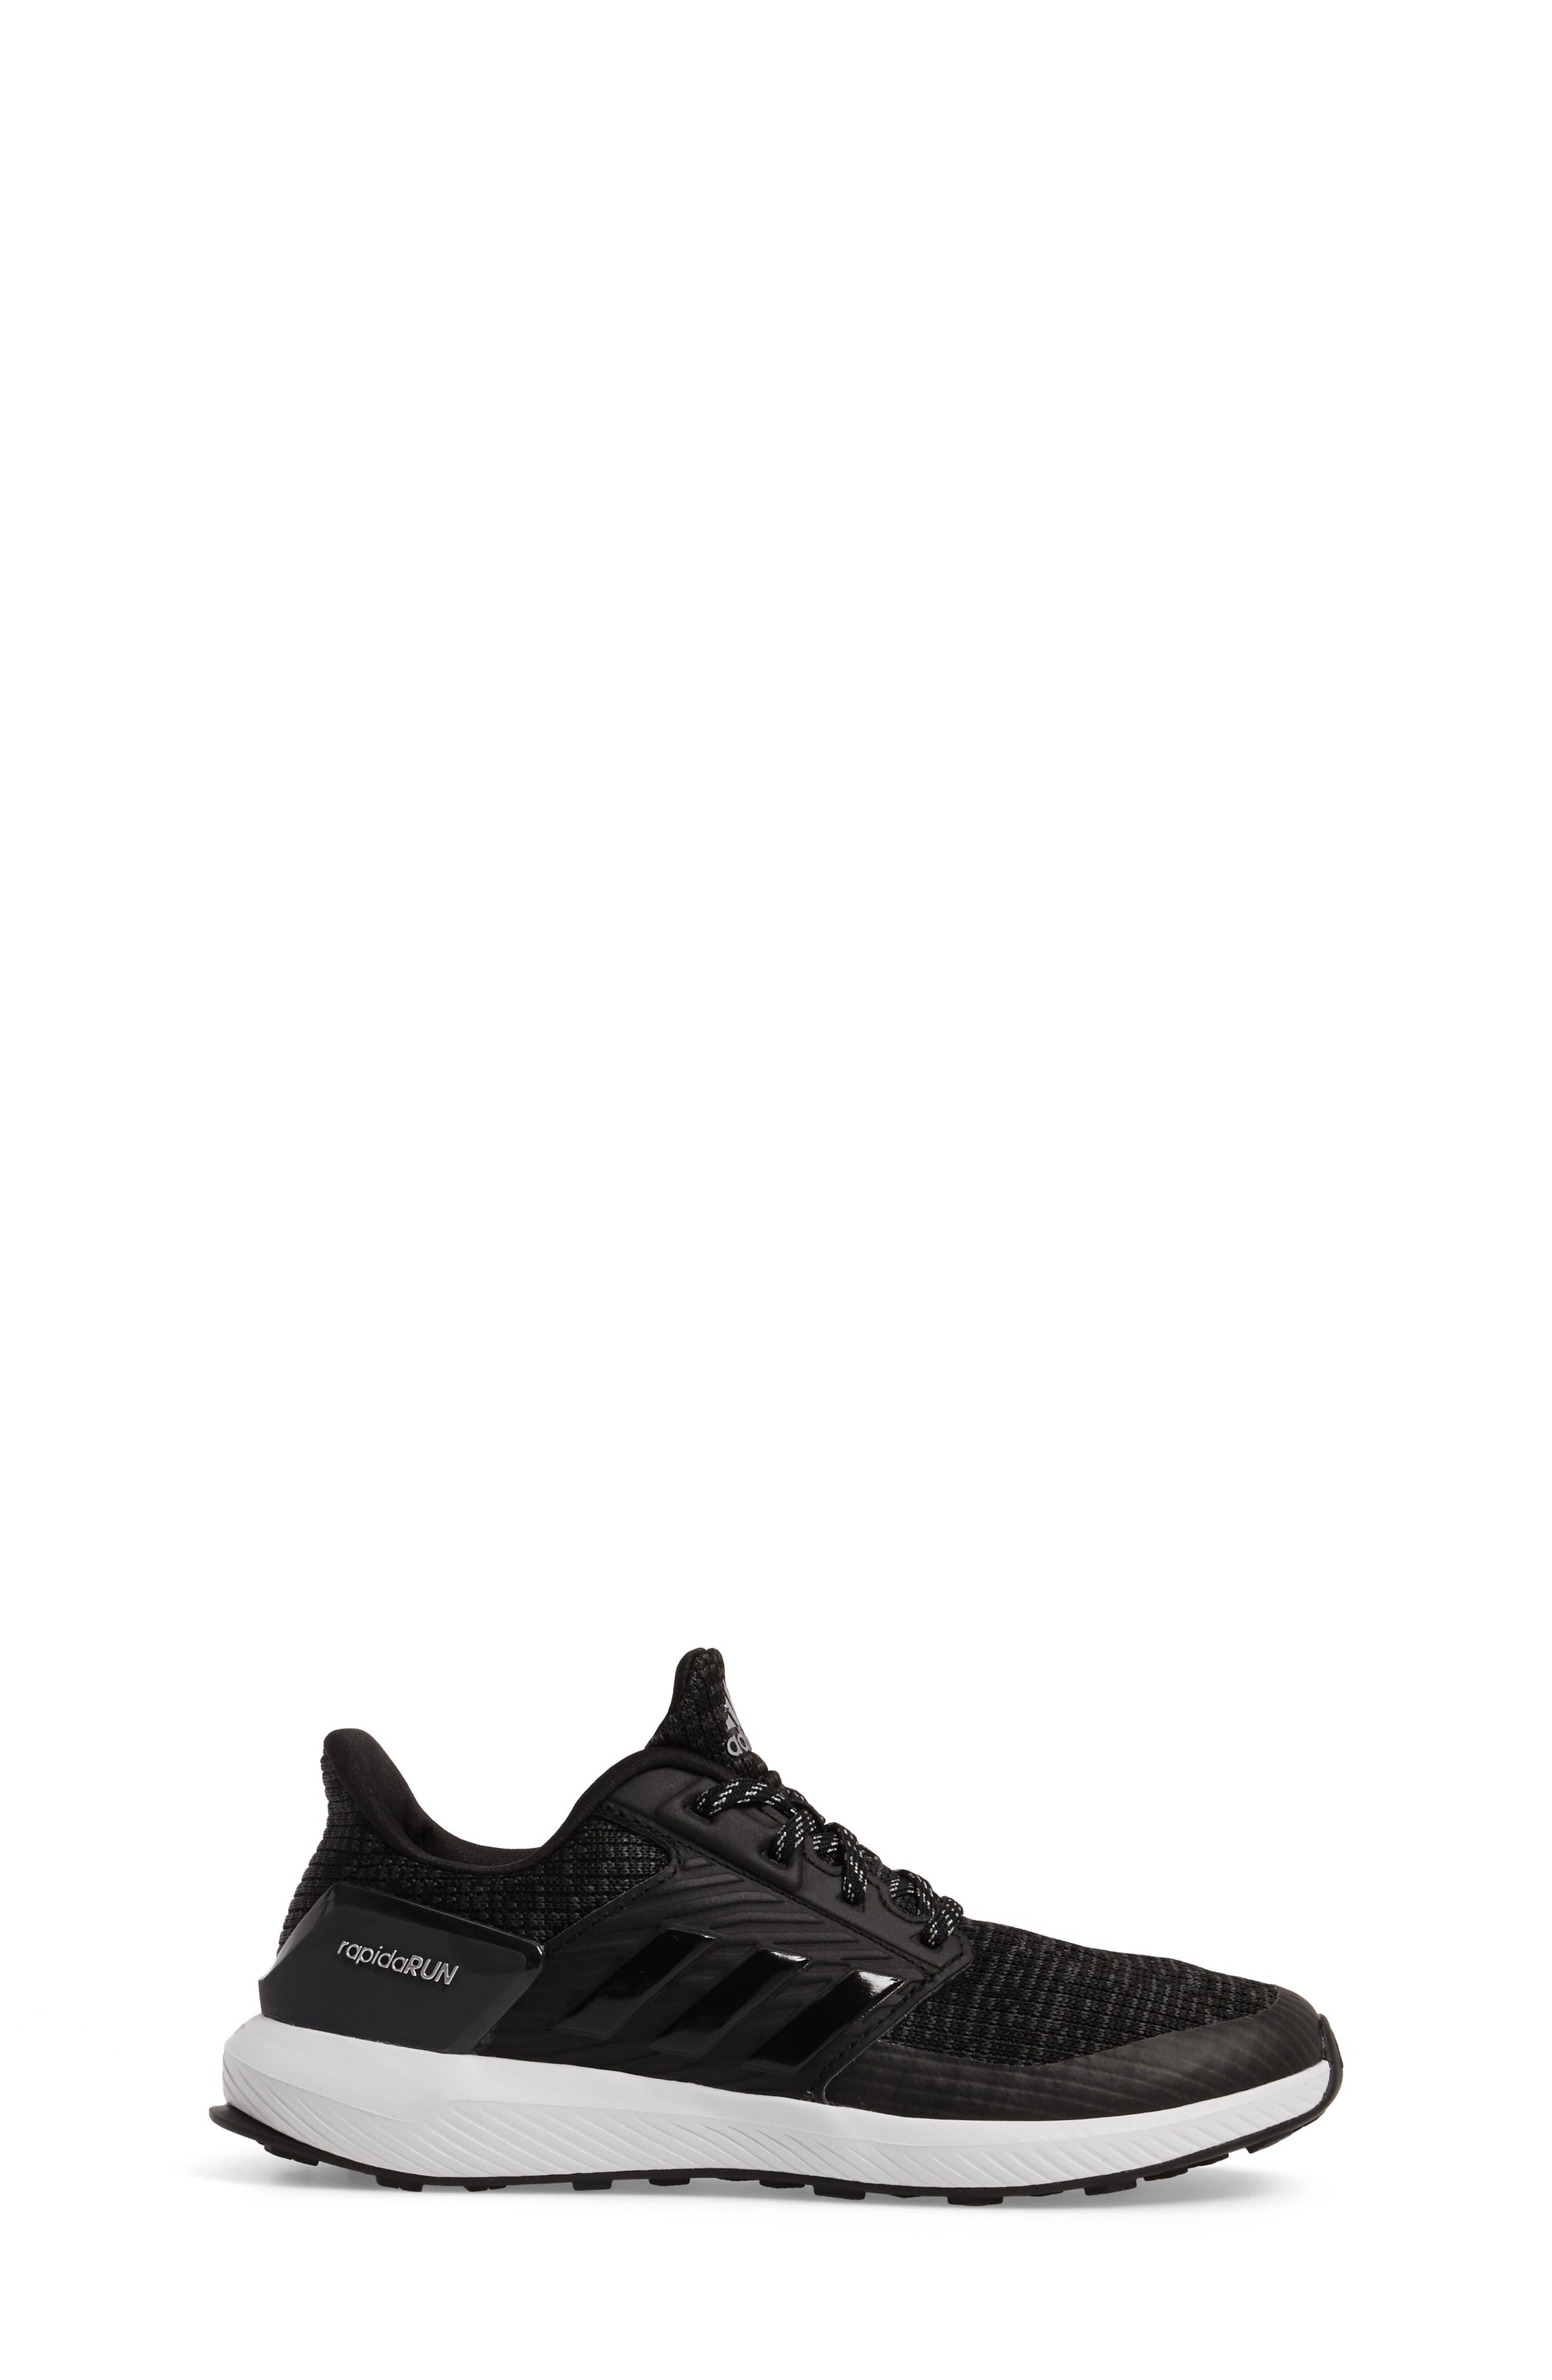 Alternate Image 3  - adidas RapidaRUN Lux Sneaker (Toddler & Little Kid)